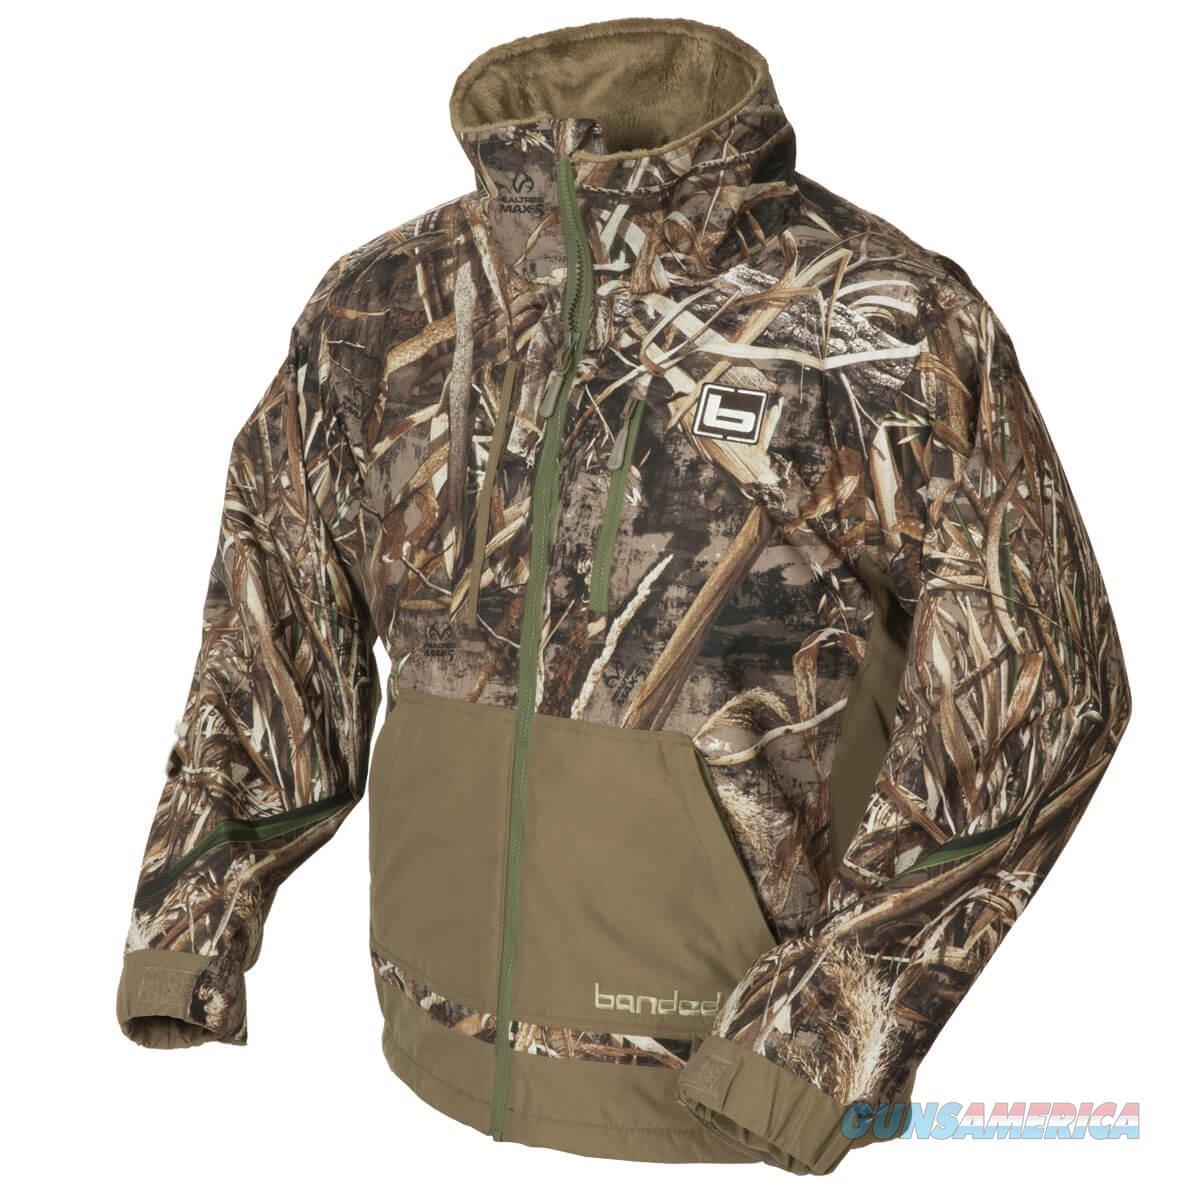 Banded Chesapeake Pullover Max 5 LG  Non-Guns > Shotgun Sports > Vests/Jackets